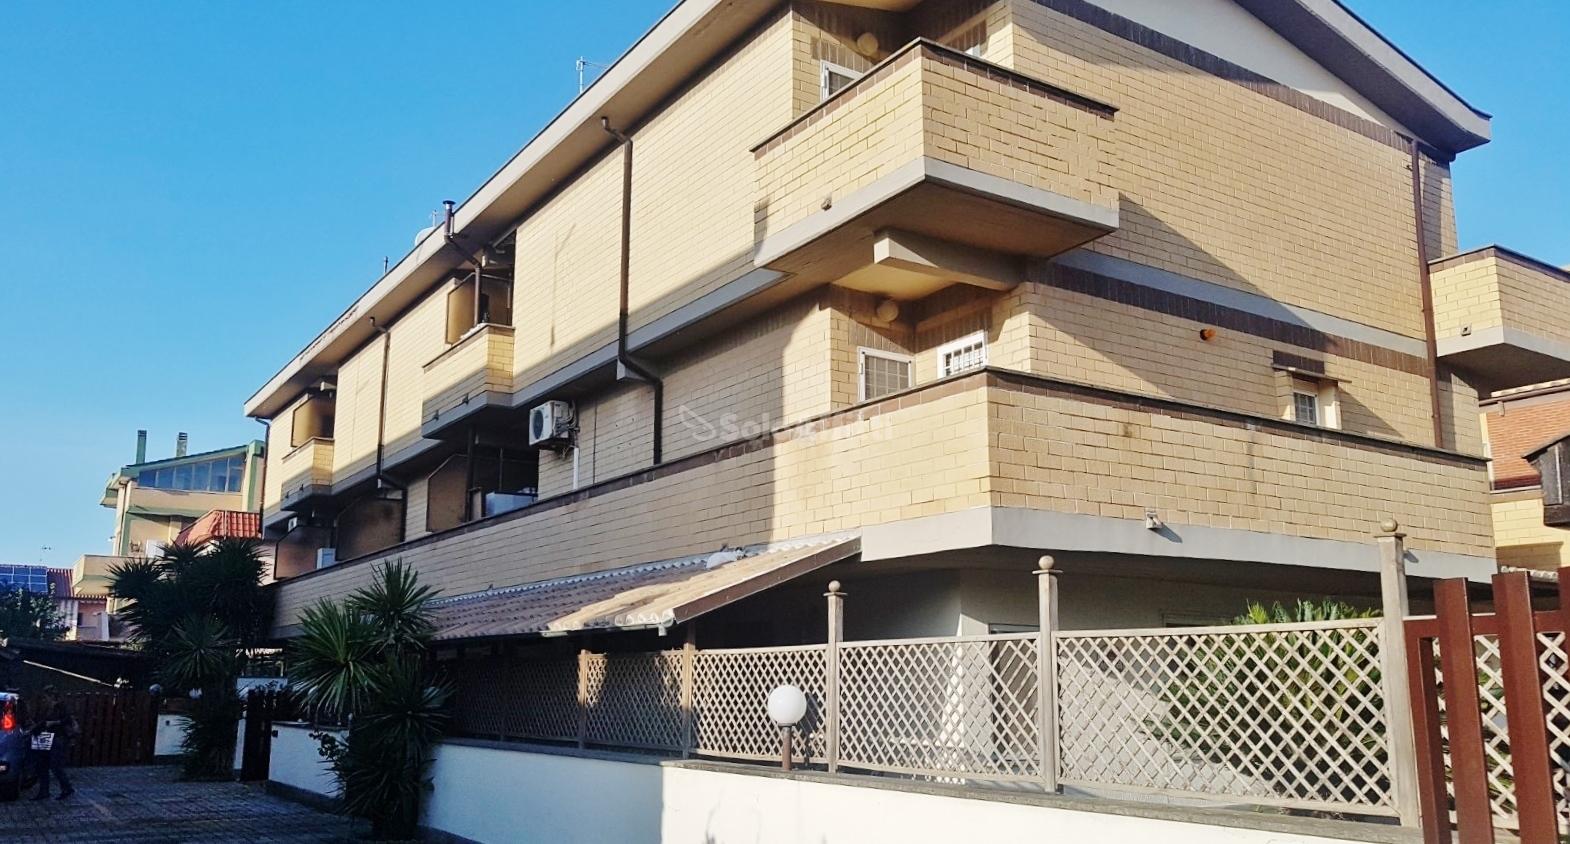 Fiumicino, Isola Sacra - villa a schiera